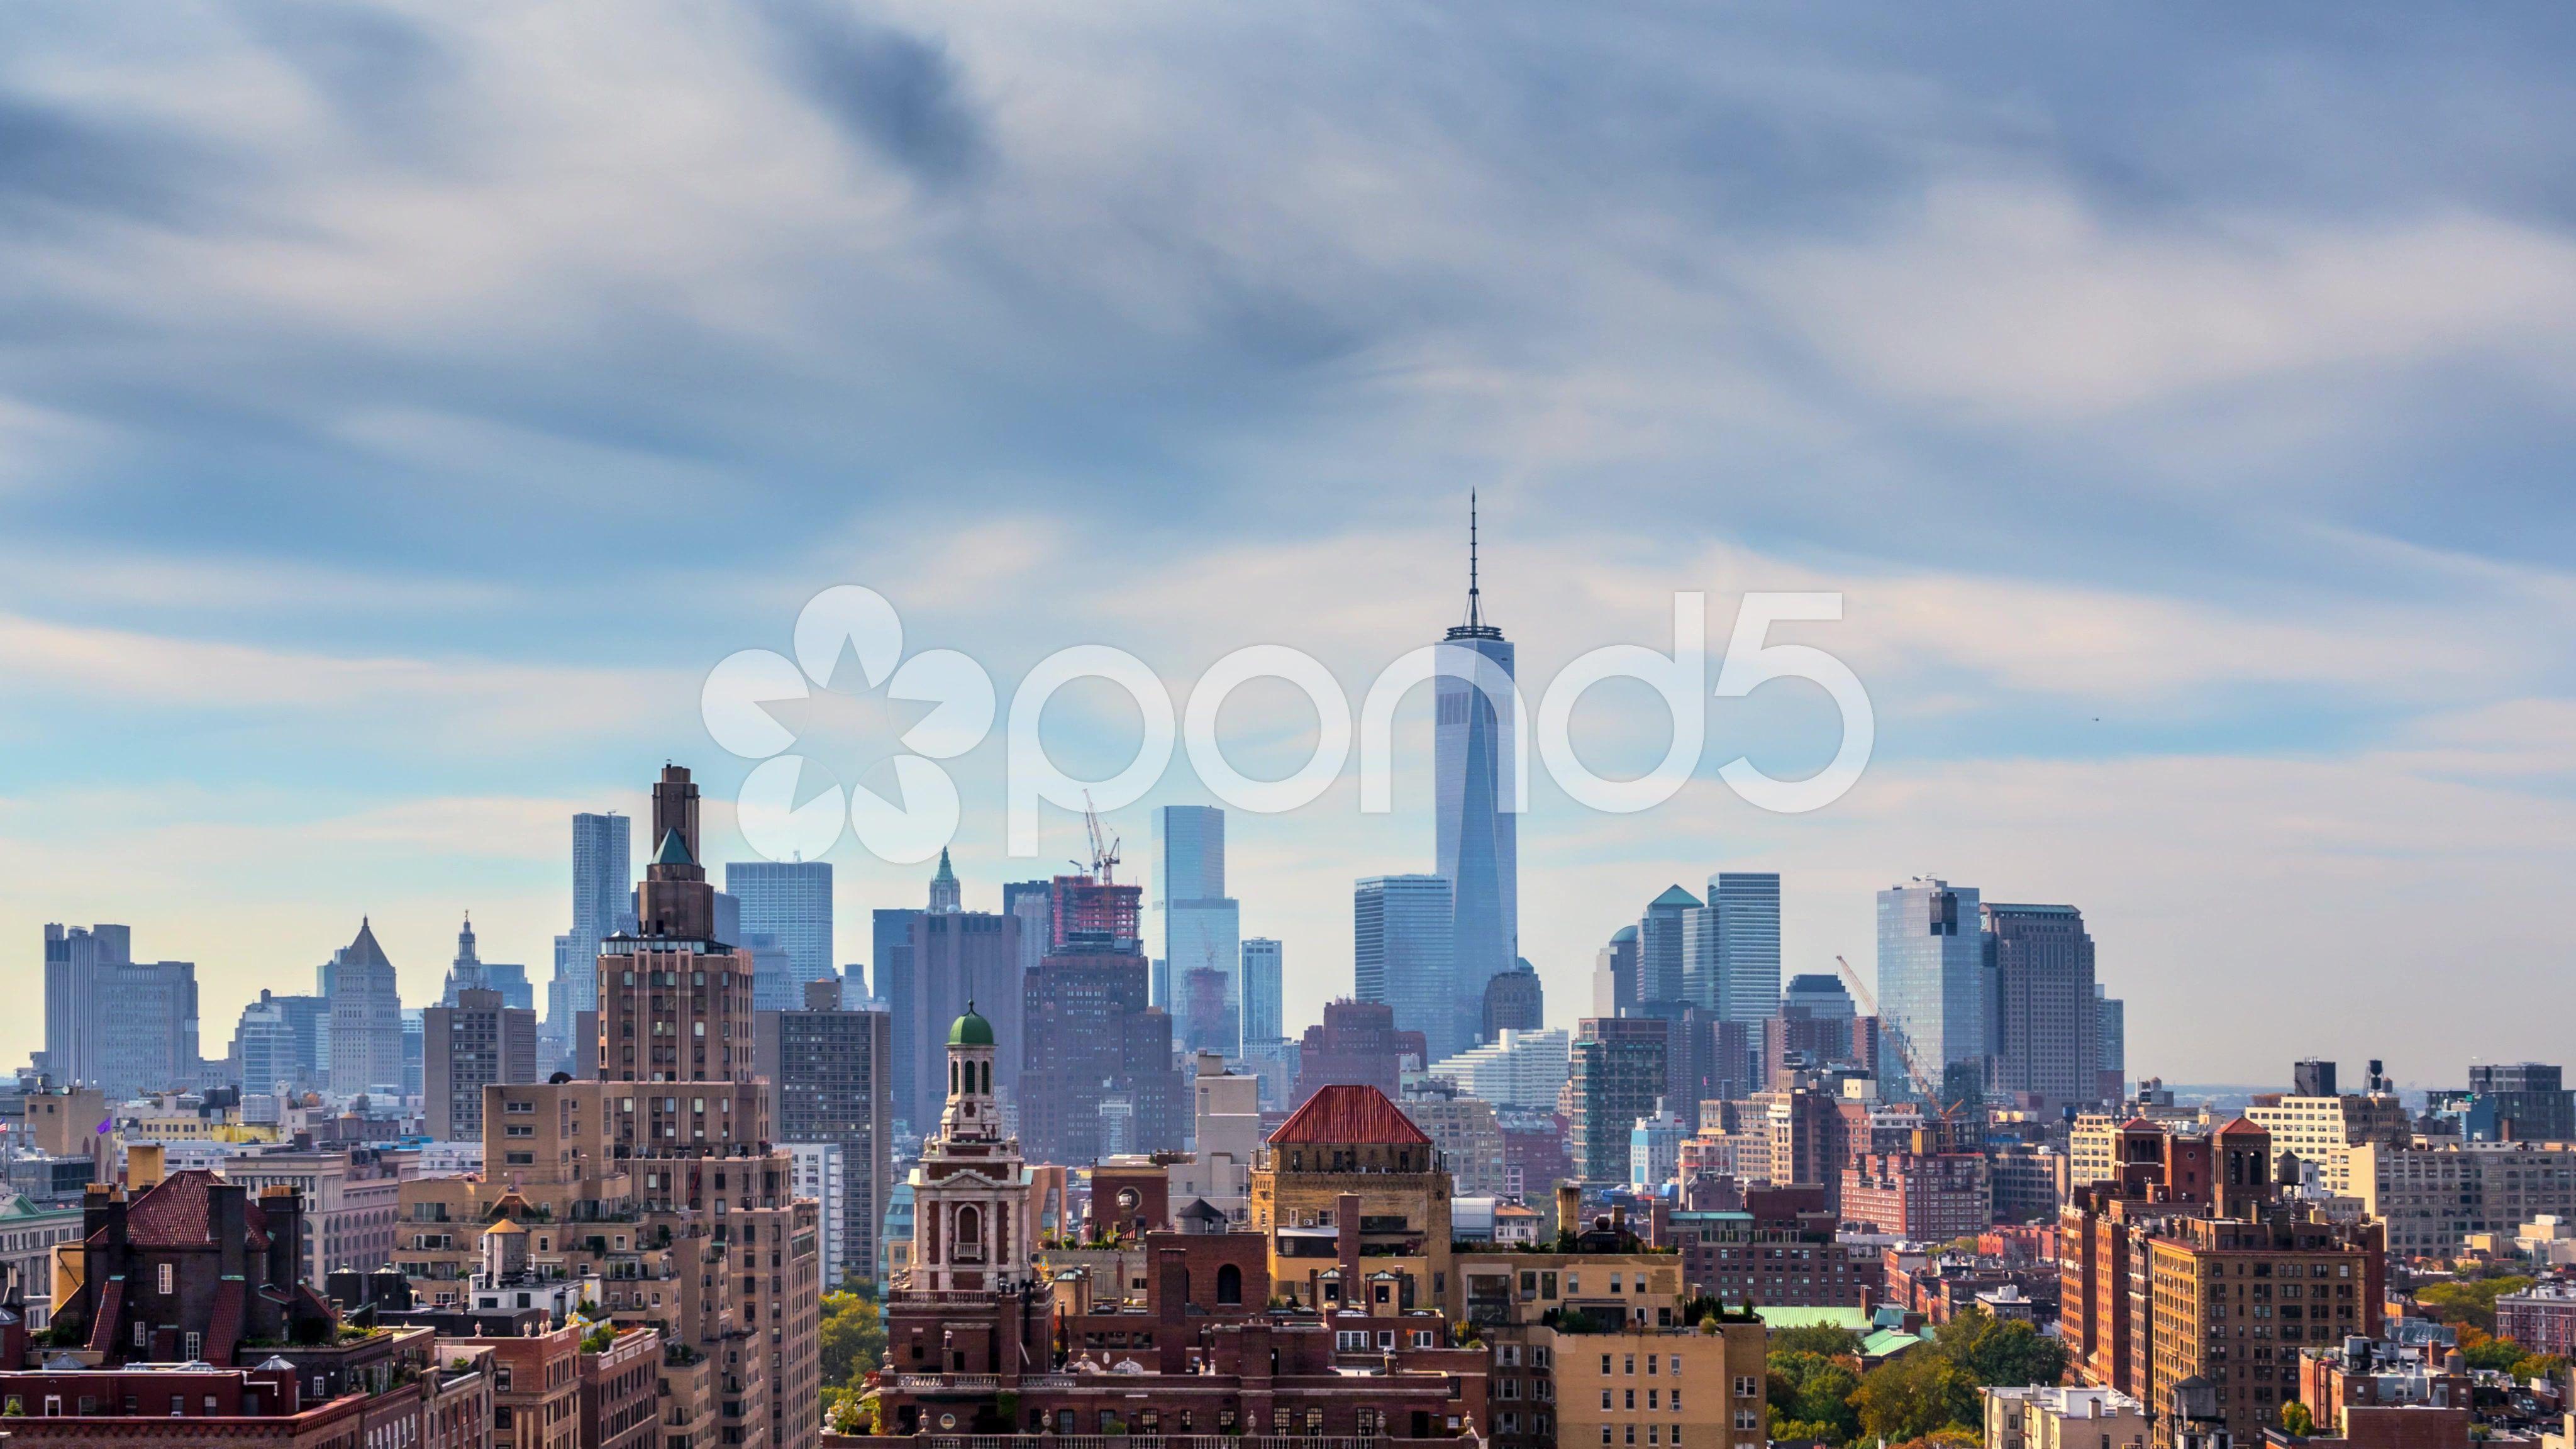 Beautiful Clouds New York City Manhattan Skyline Nyc Ny 4k Uhd Timelapse Stock Footage City Manhattan Sk New York City Manhattan Manhattan Skyline Skyline